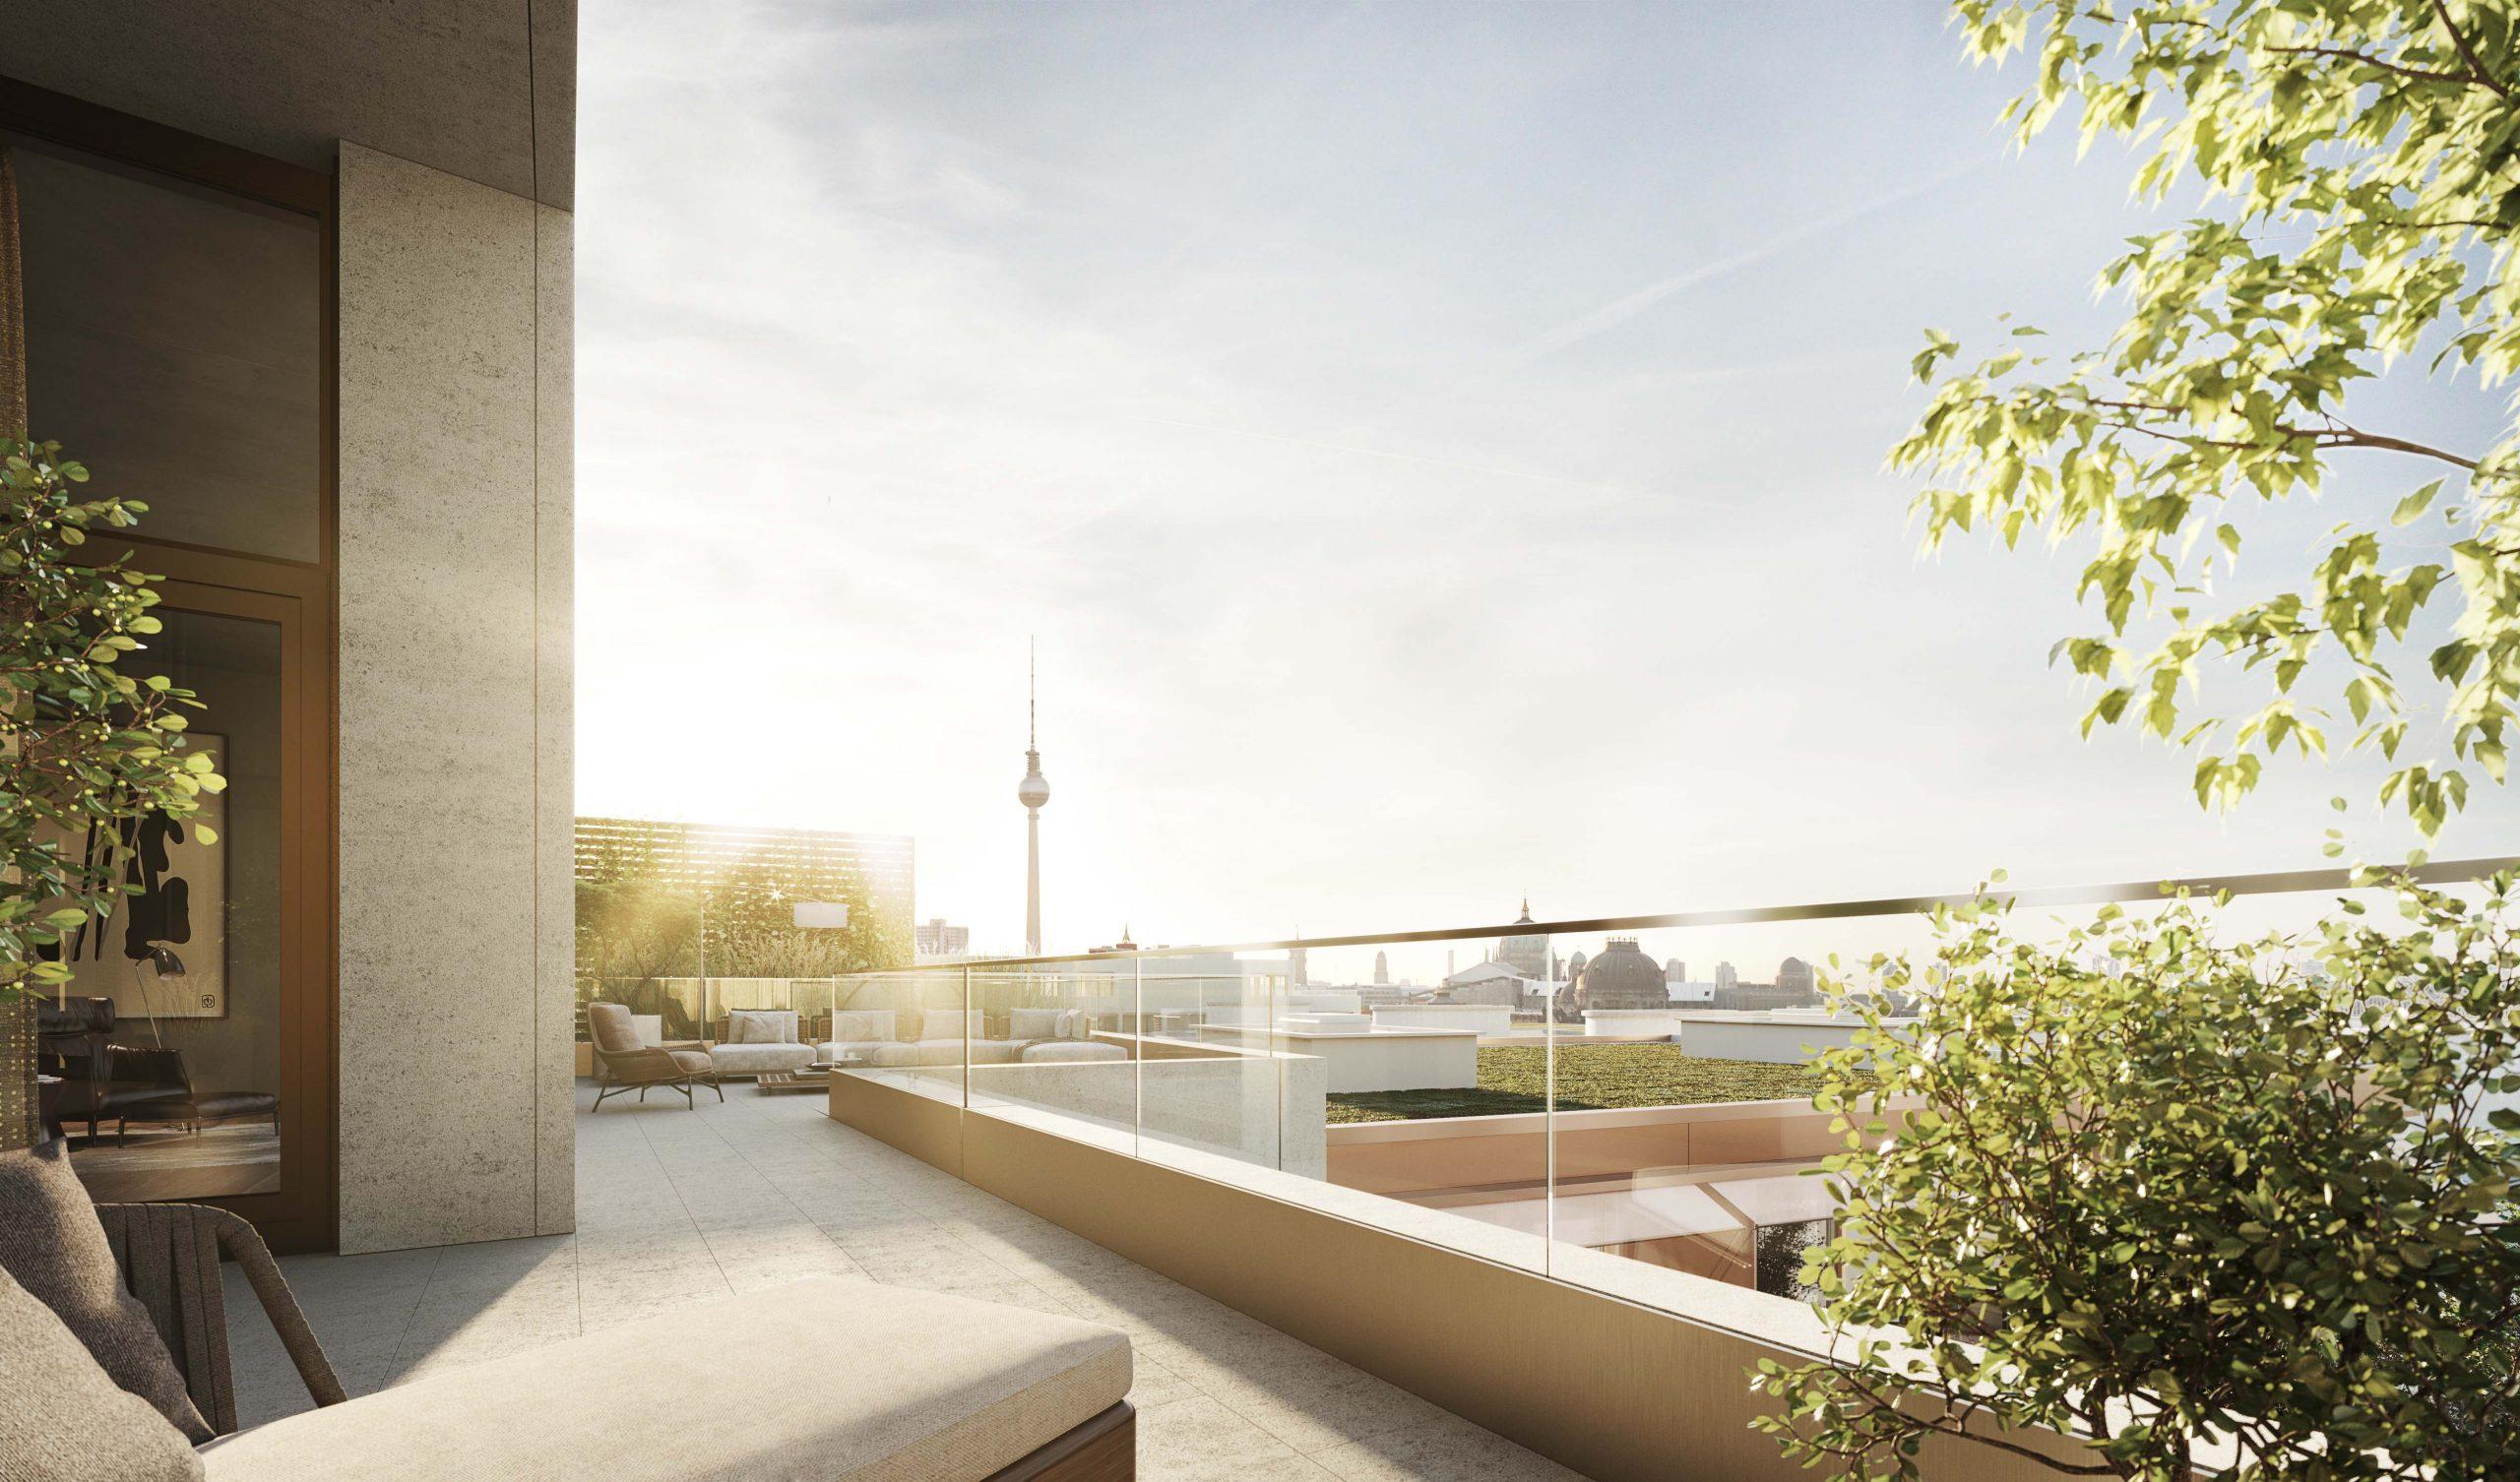 Form3 (JON) – Ausblick Penthouse